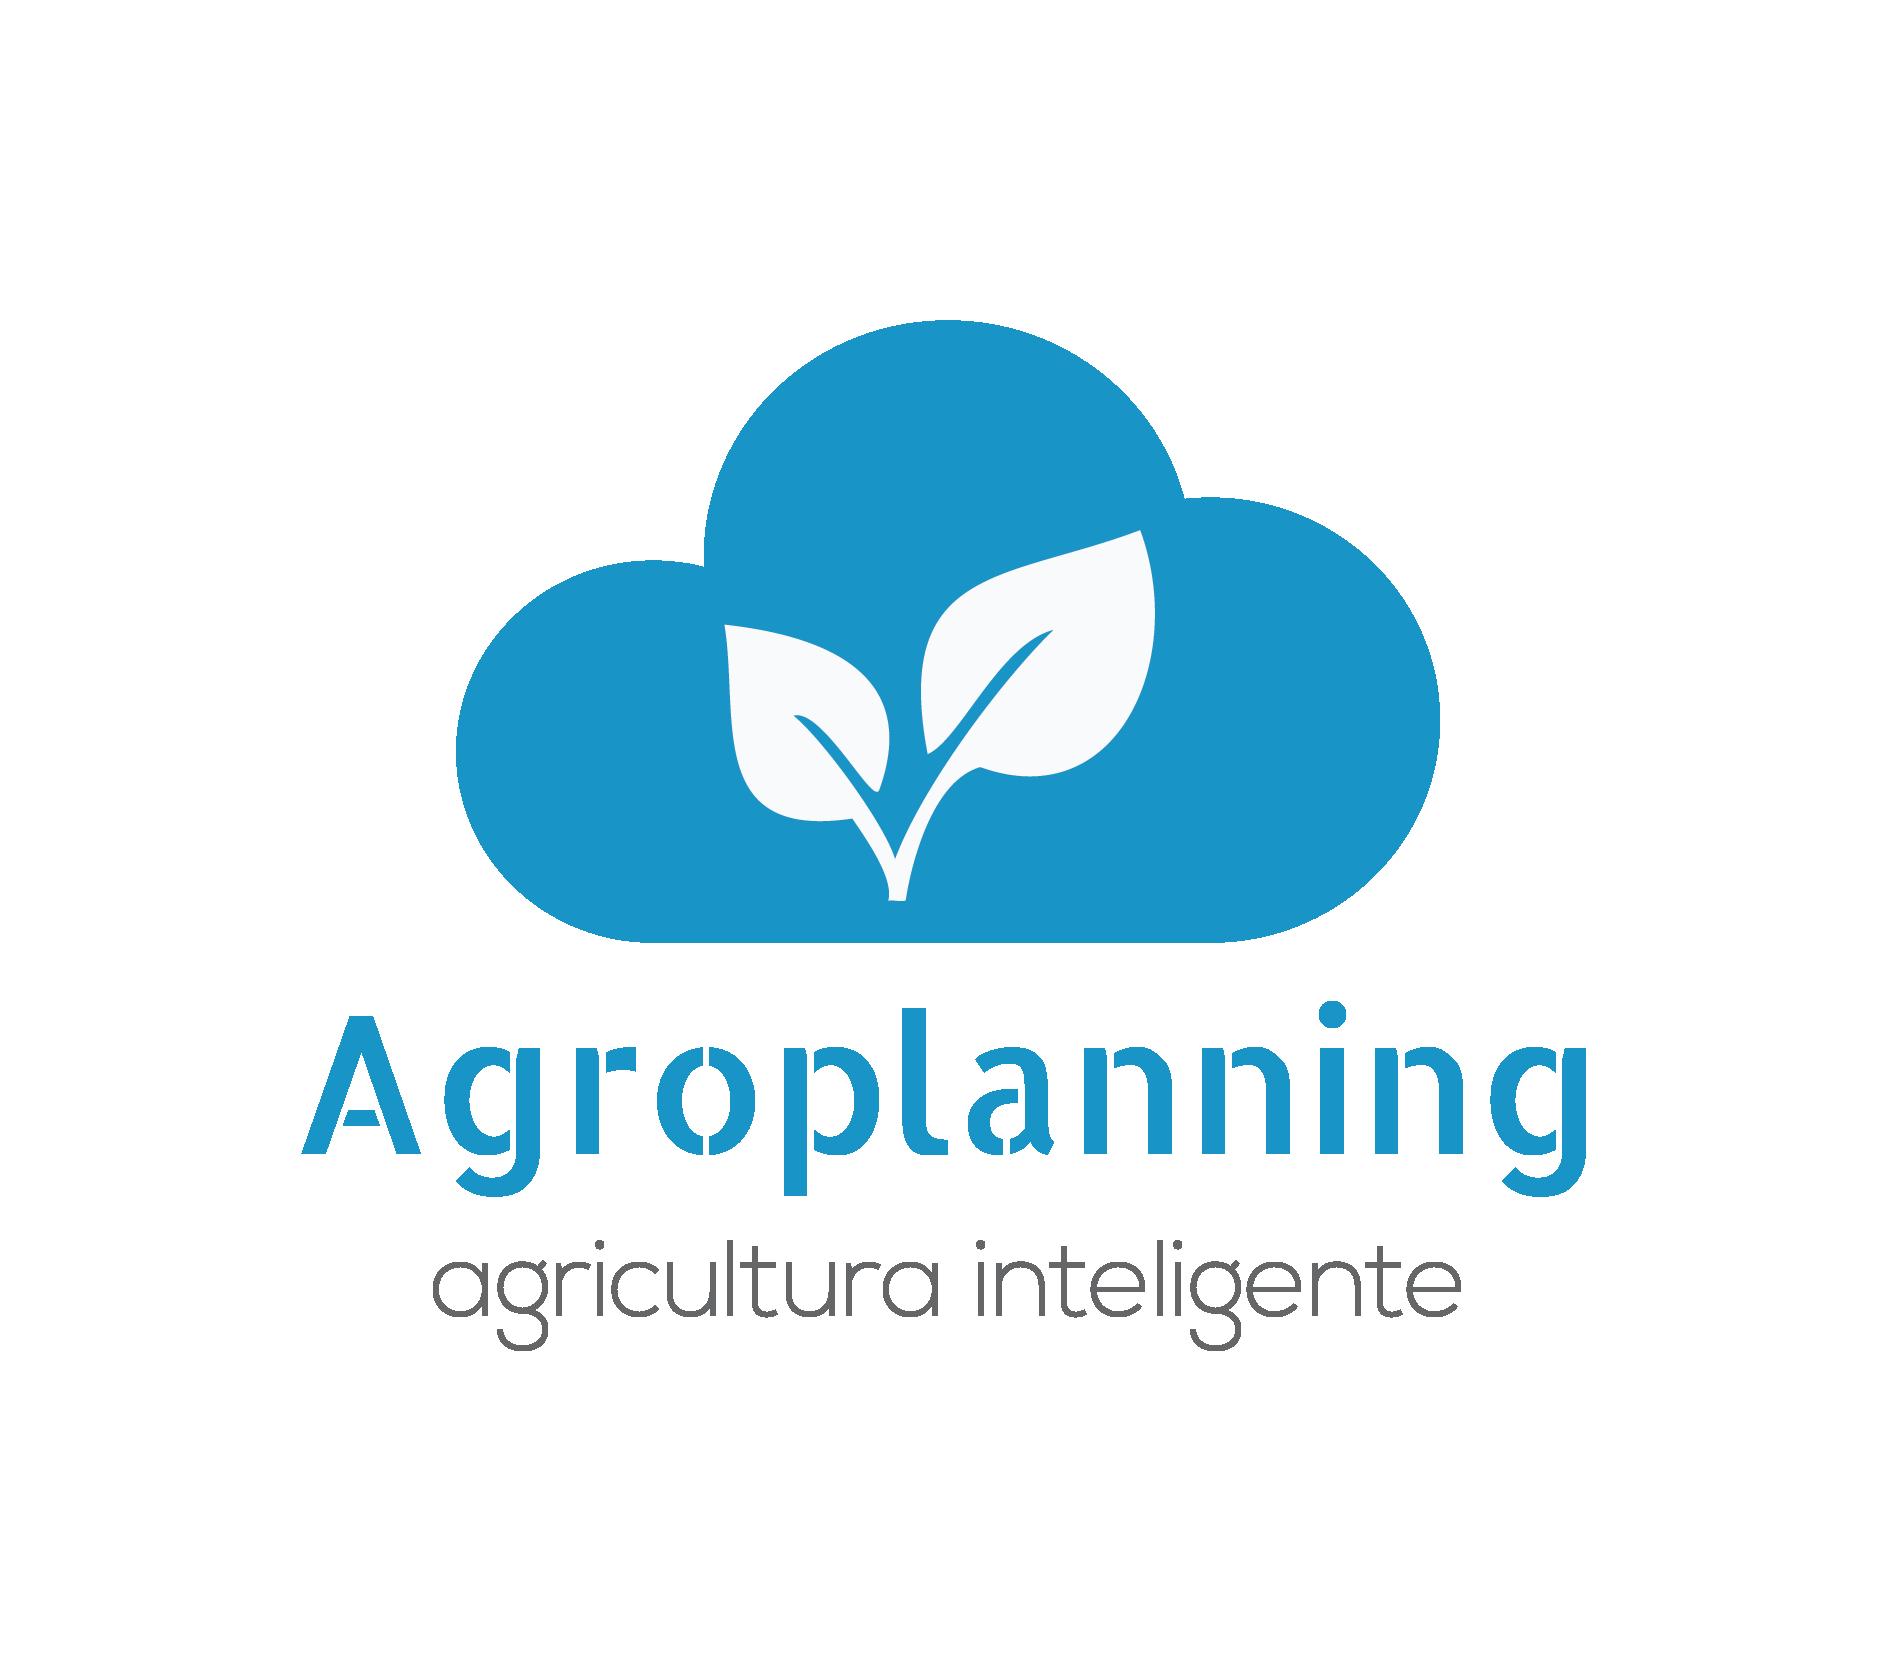 Agroplanning